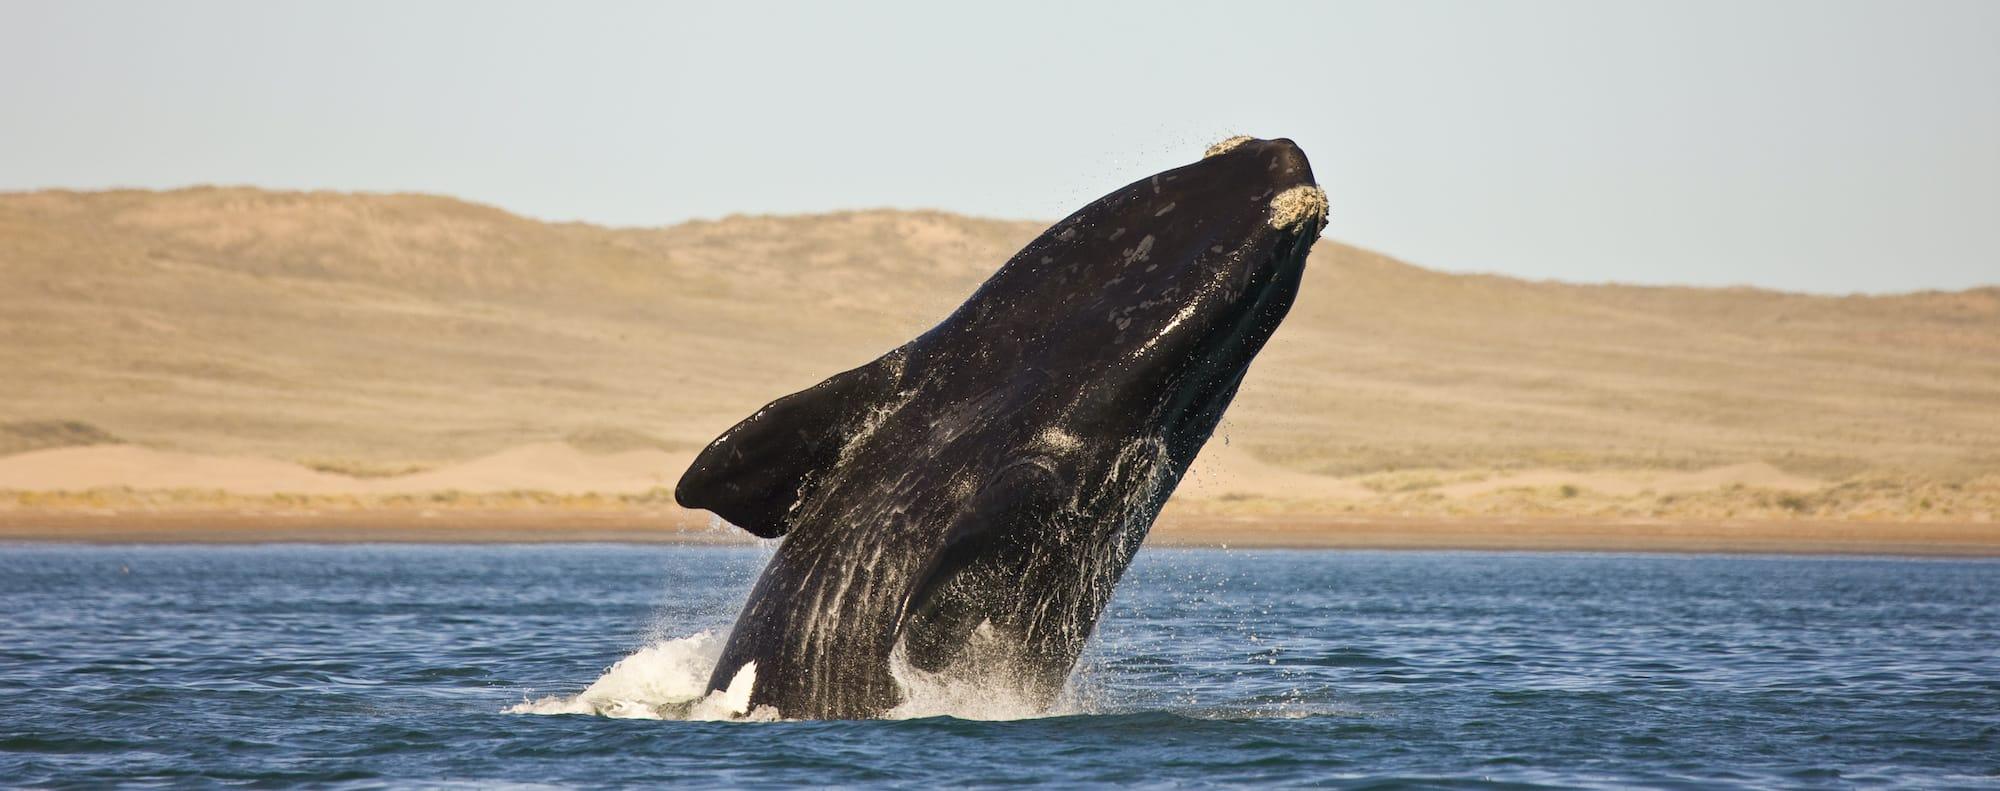 Whale watching Patagonia Argentina Puerto Madryn Peninsula Valdés